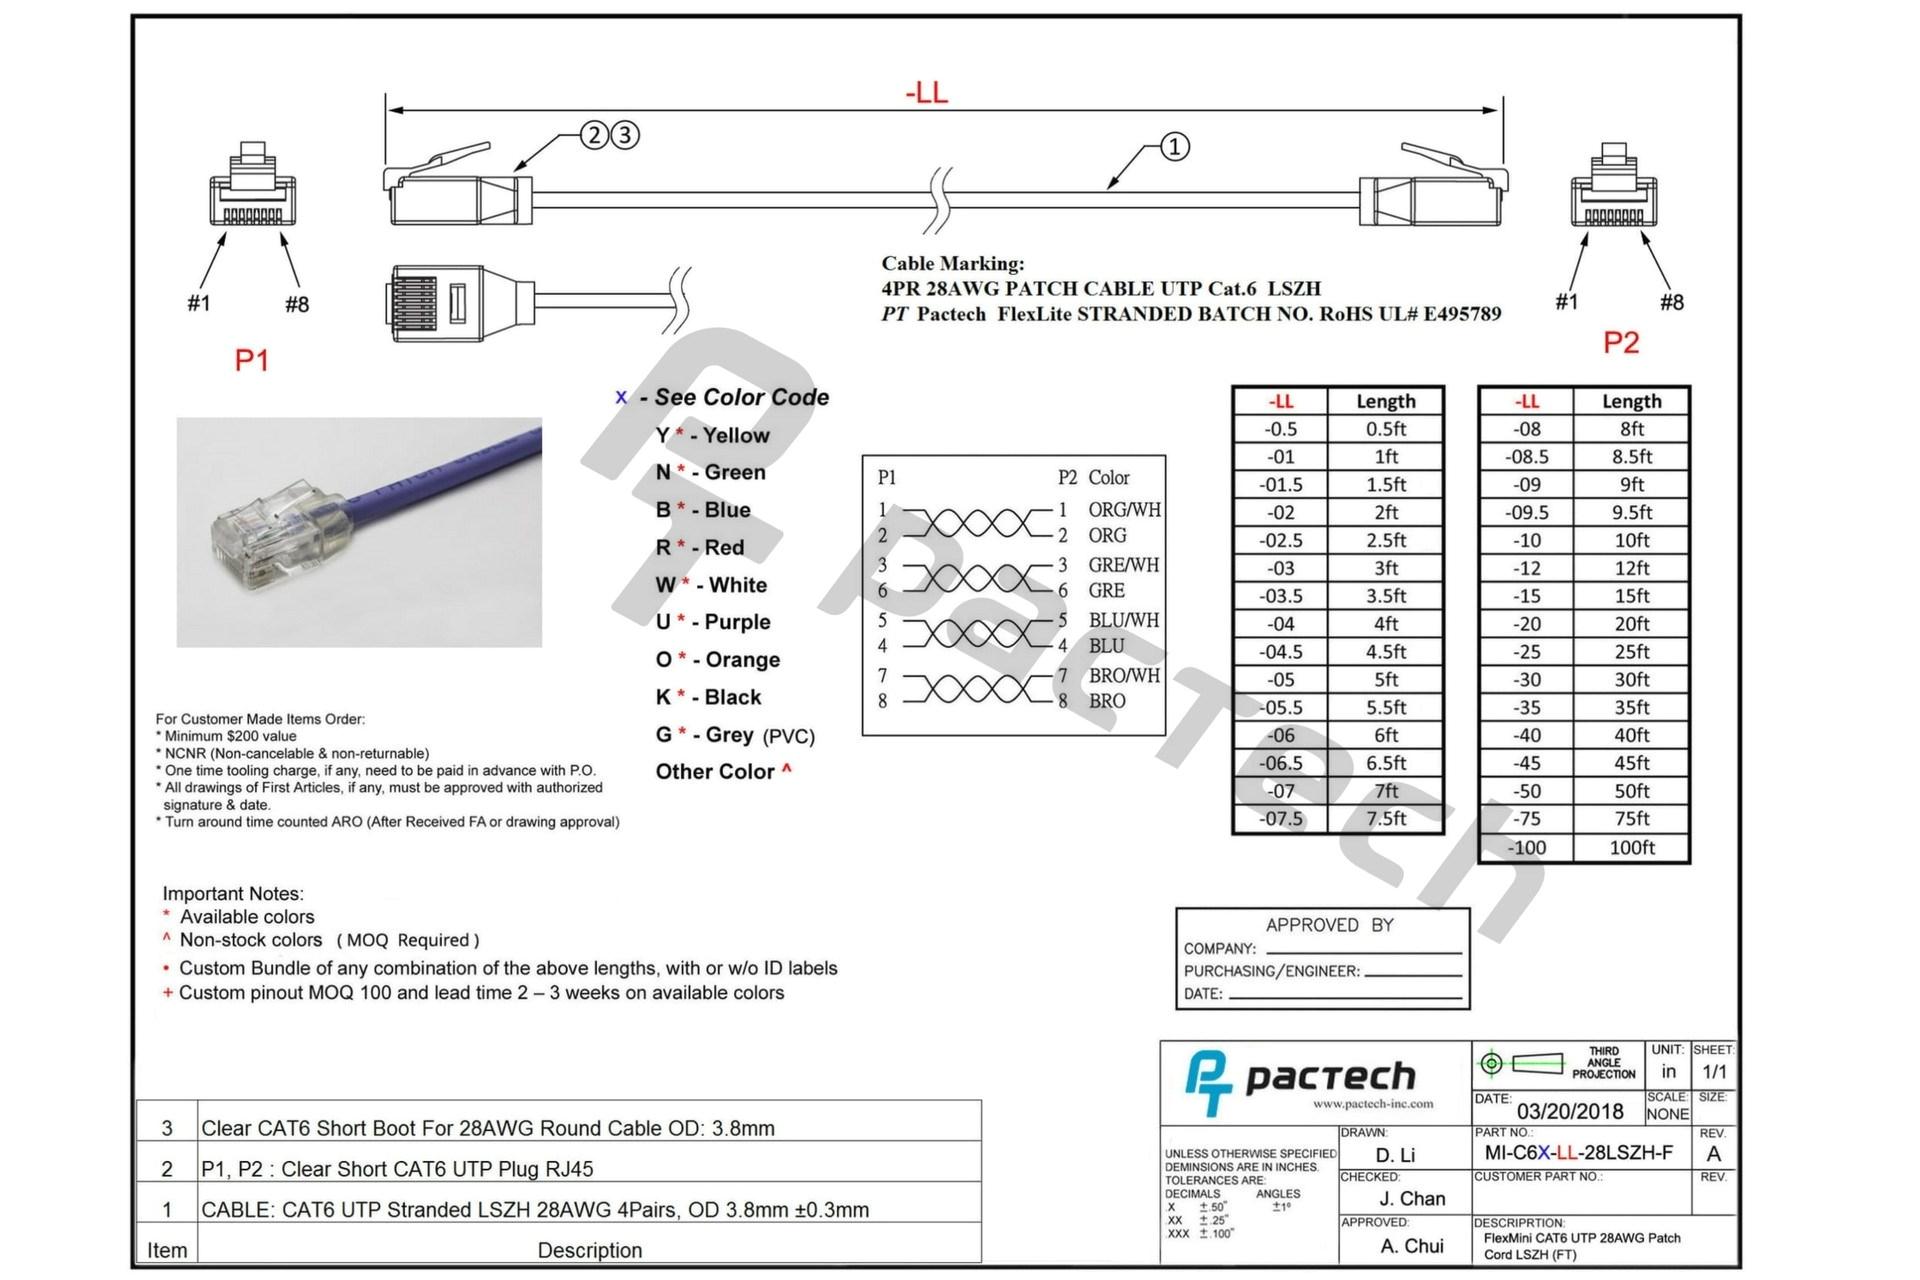 rj11 jack wiring diagram rj11 wall socket wiring diagram australia fresh rj45 wall socket wiring diagram australia fresh ethernet cable 9h jpg